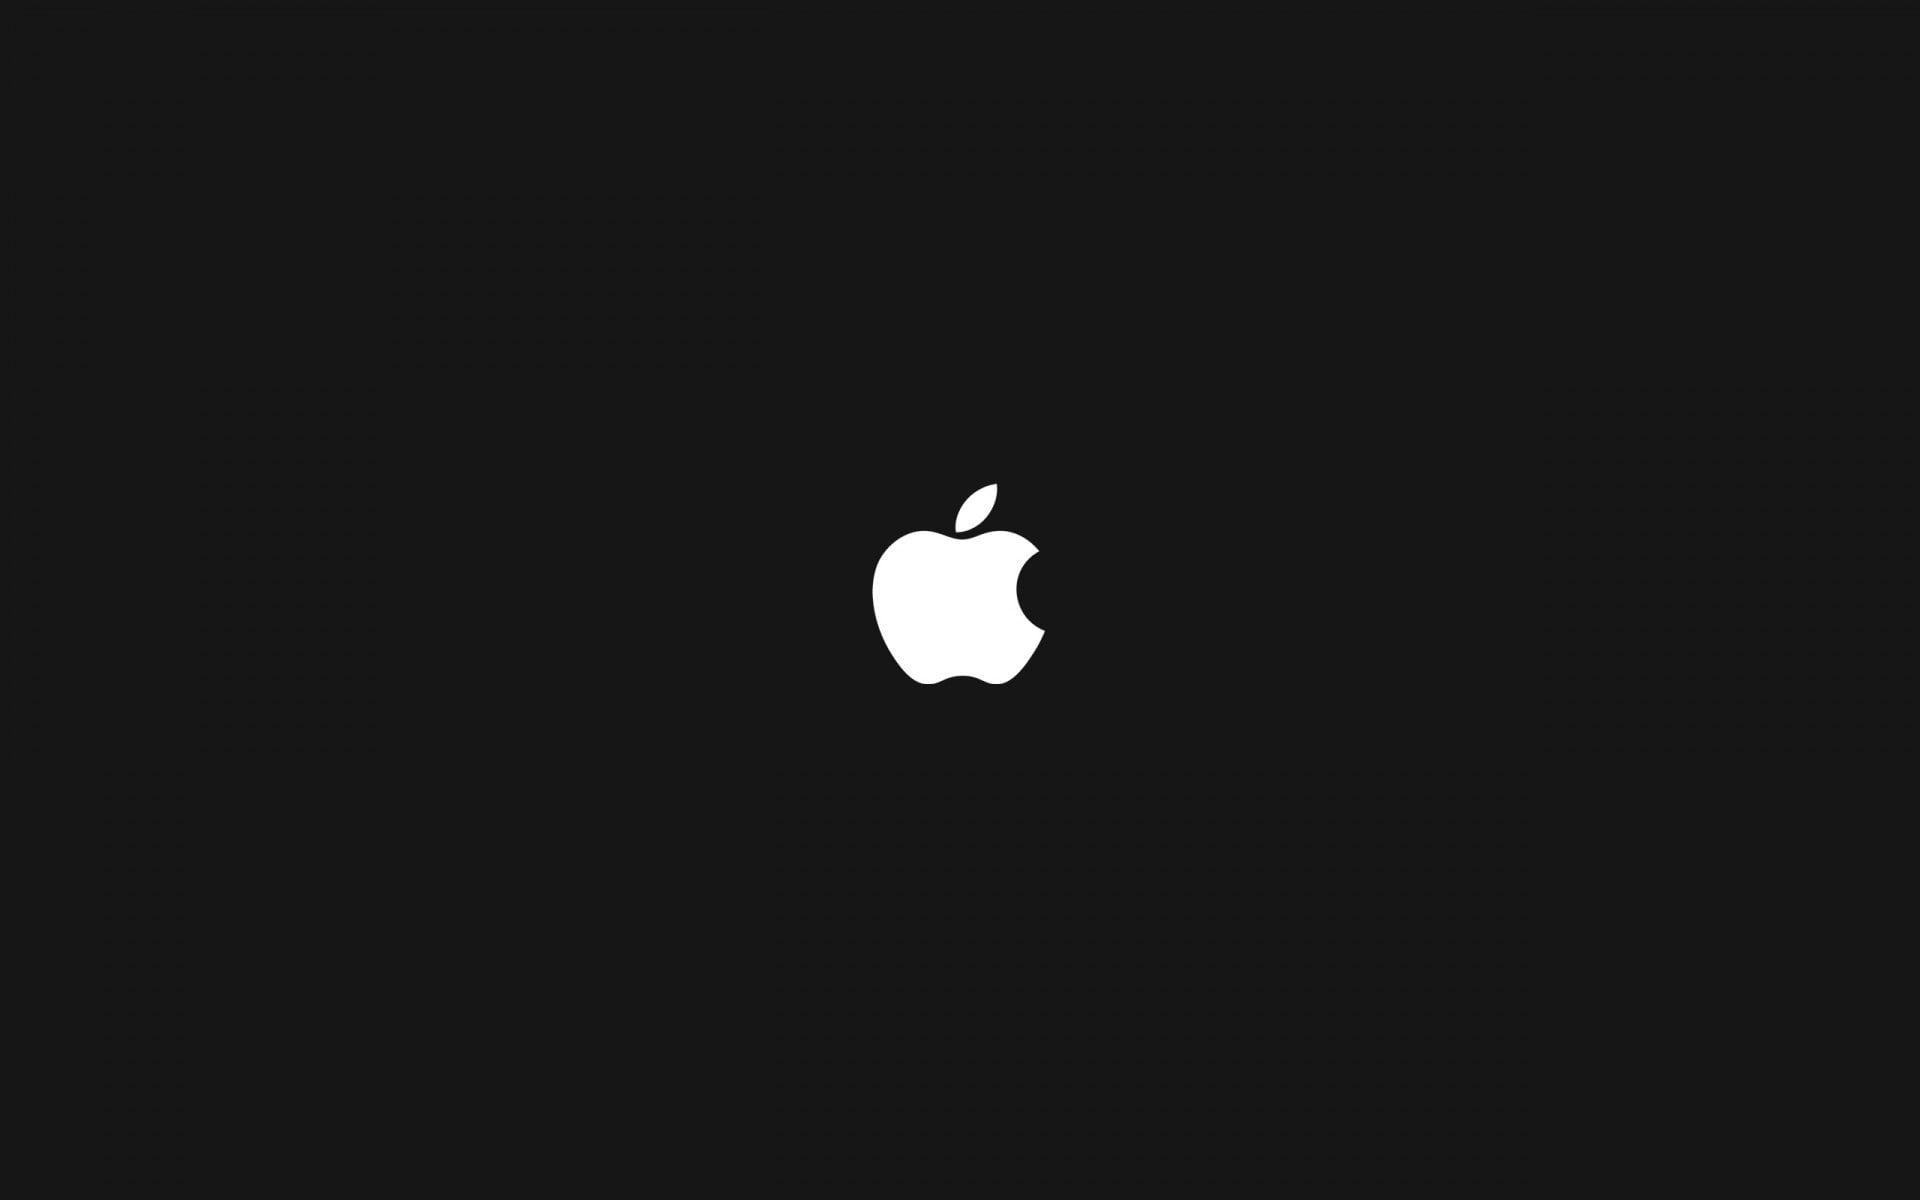 Apple Desktop Backgrounds For Winter 1080p Wallpaper Hdwallpaper Desktop Apple Logo Wallpaper Apple Wallpaper Iphone Apple Wallpaper Apple logo apple wallpaper hd 1080p